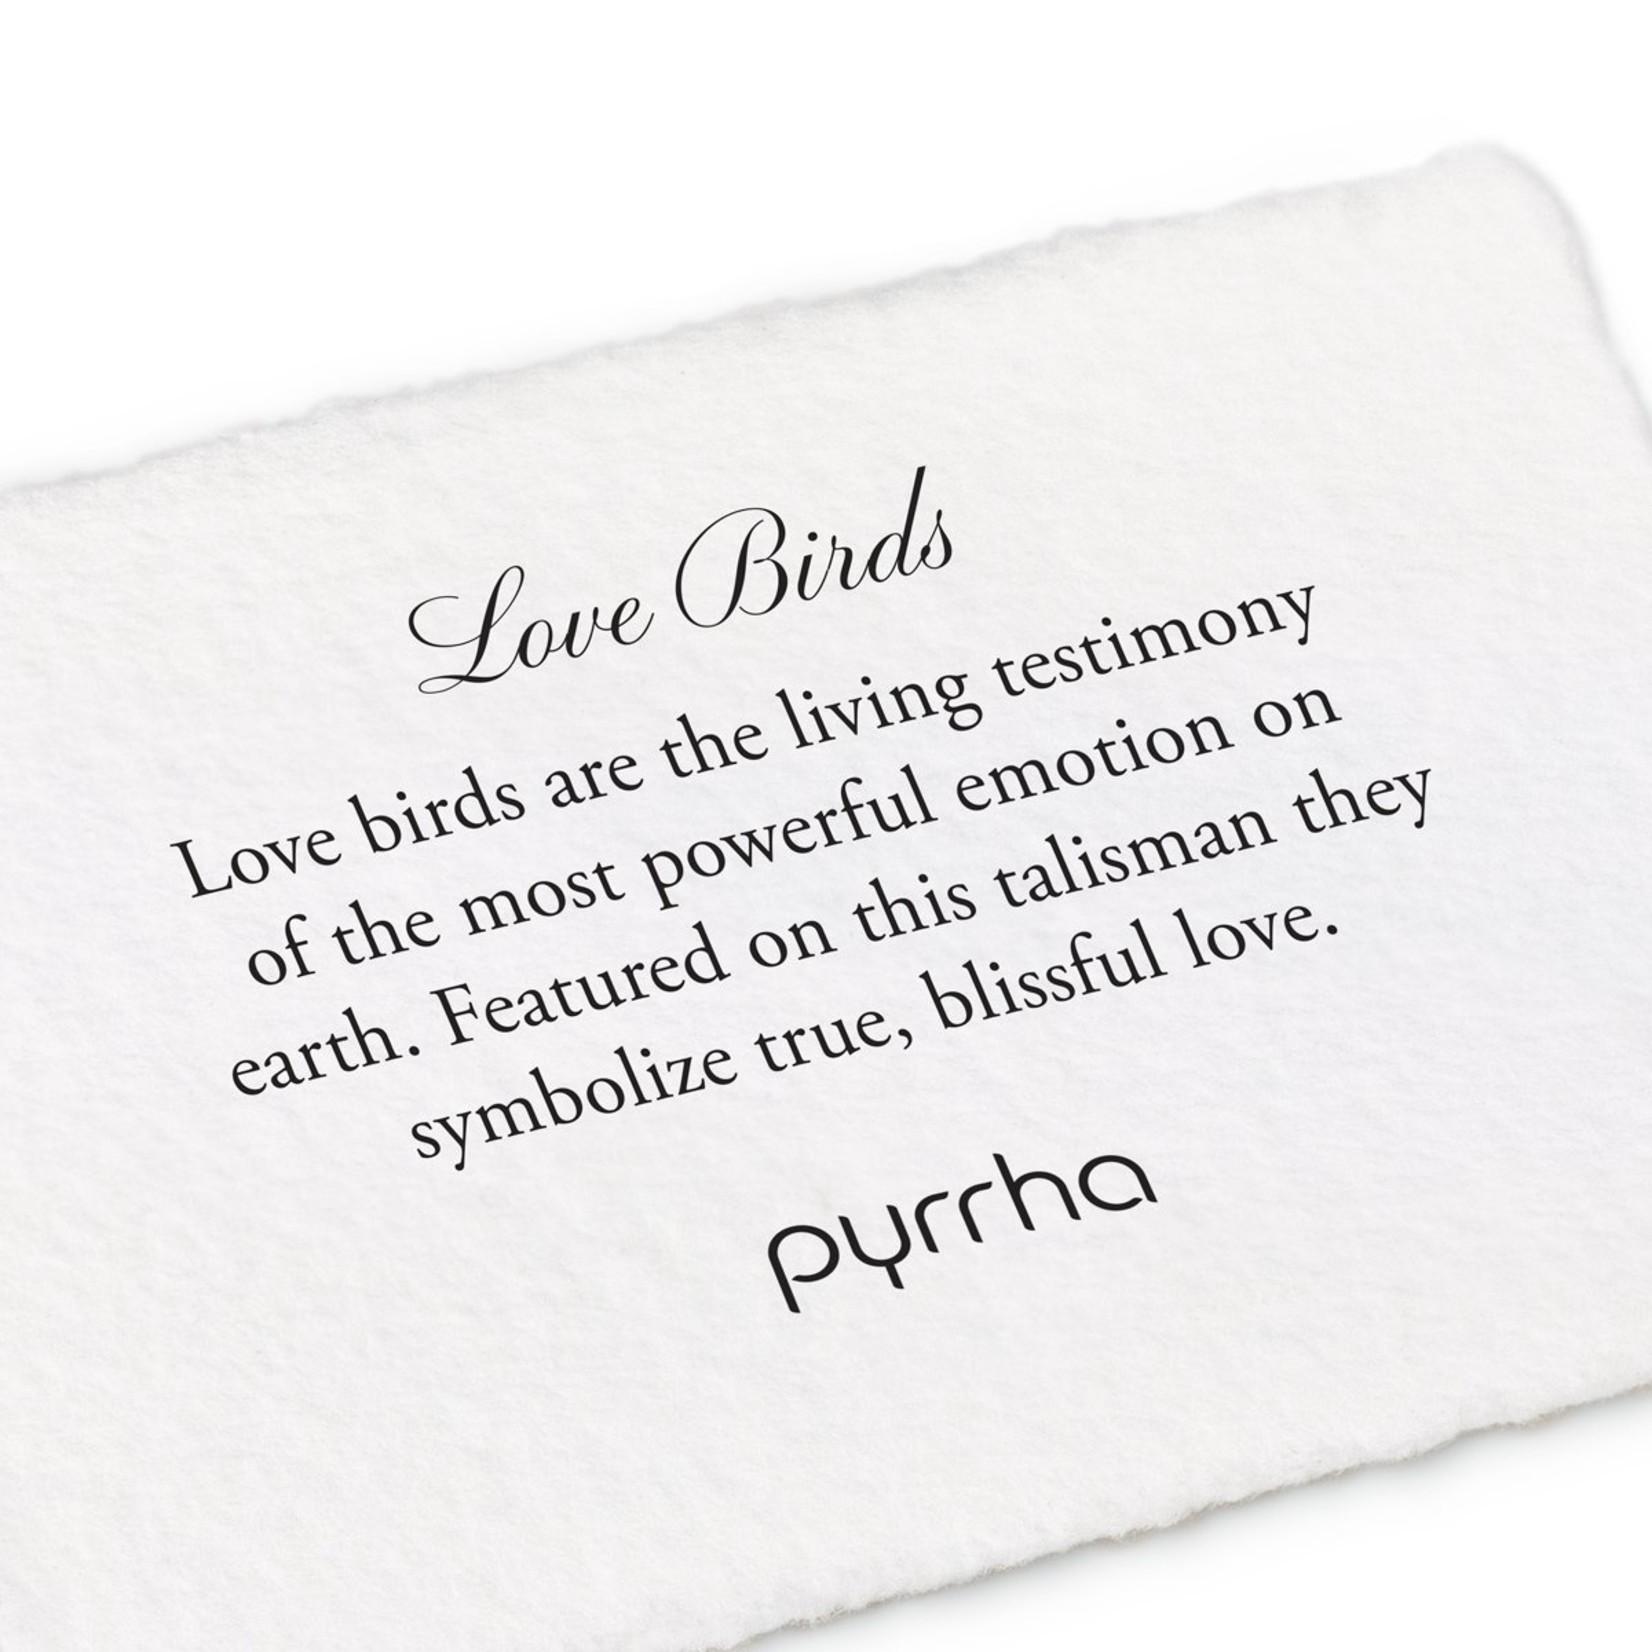 Pyrrha Love Birds Signature Talisman